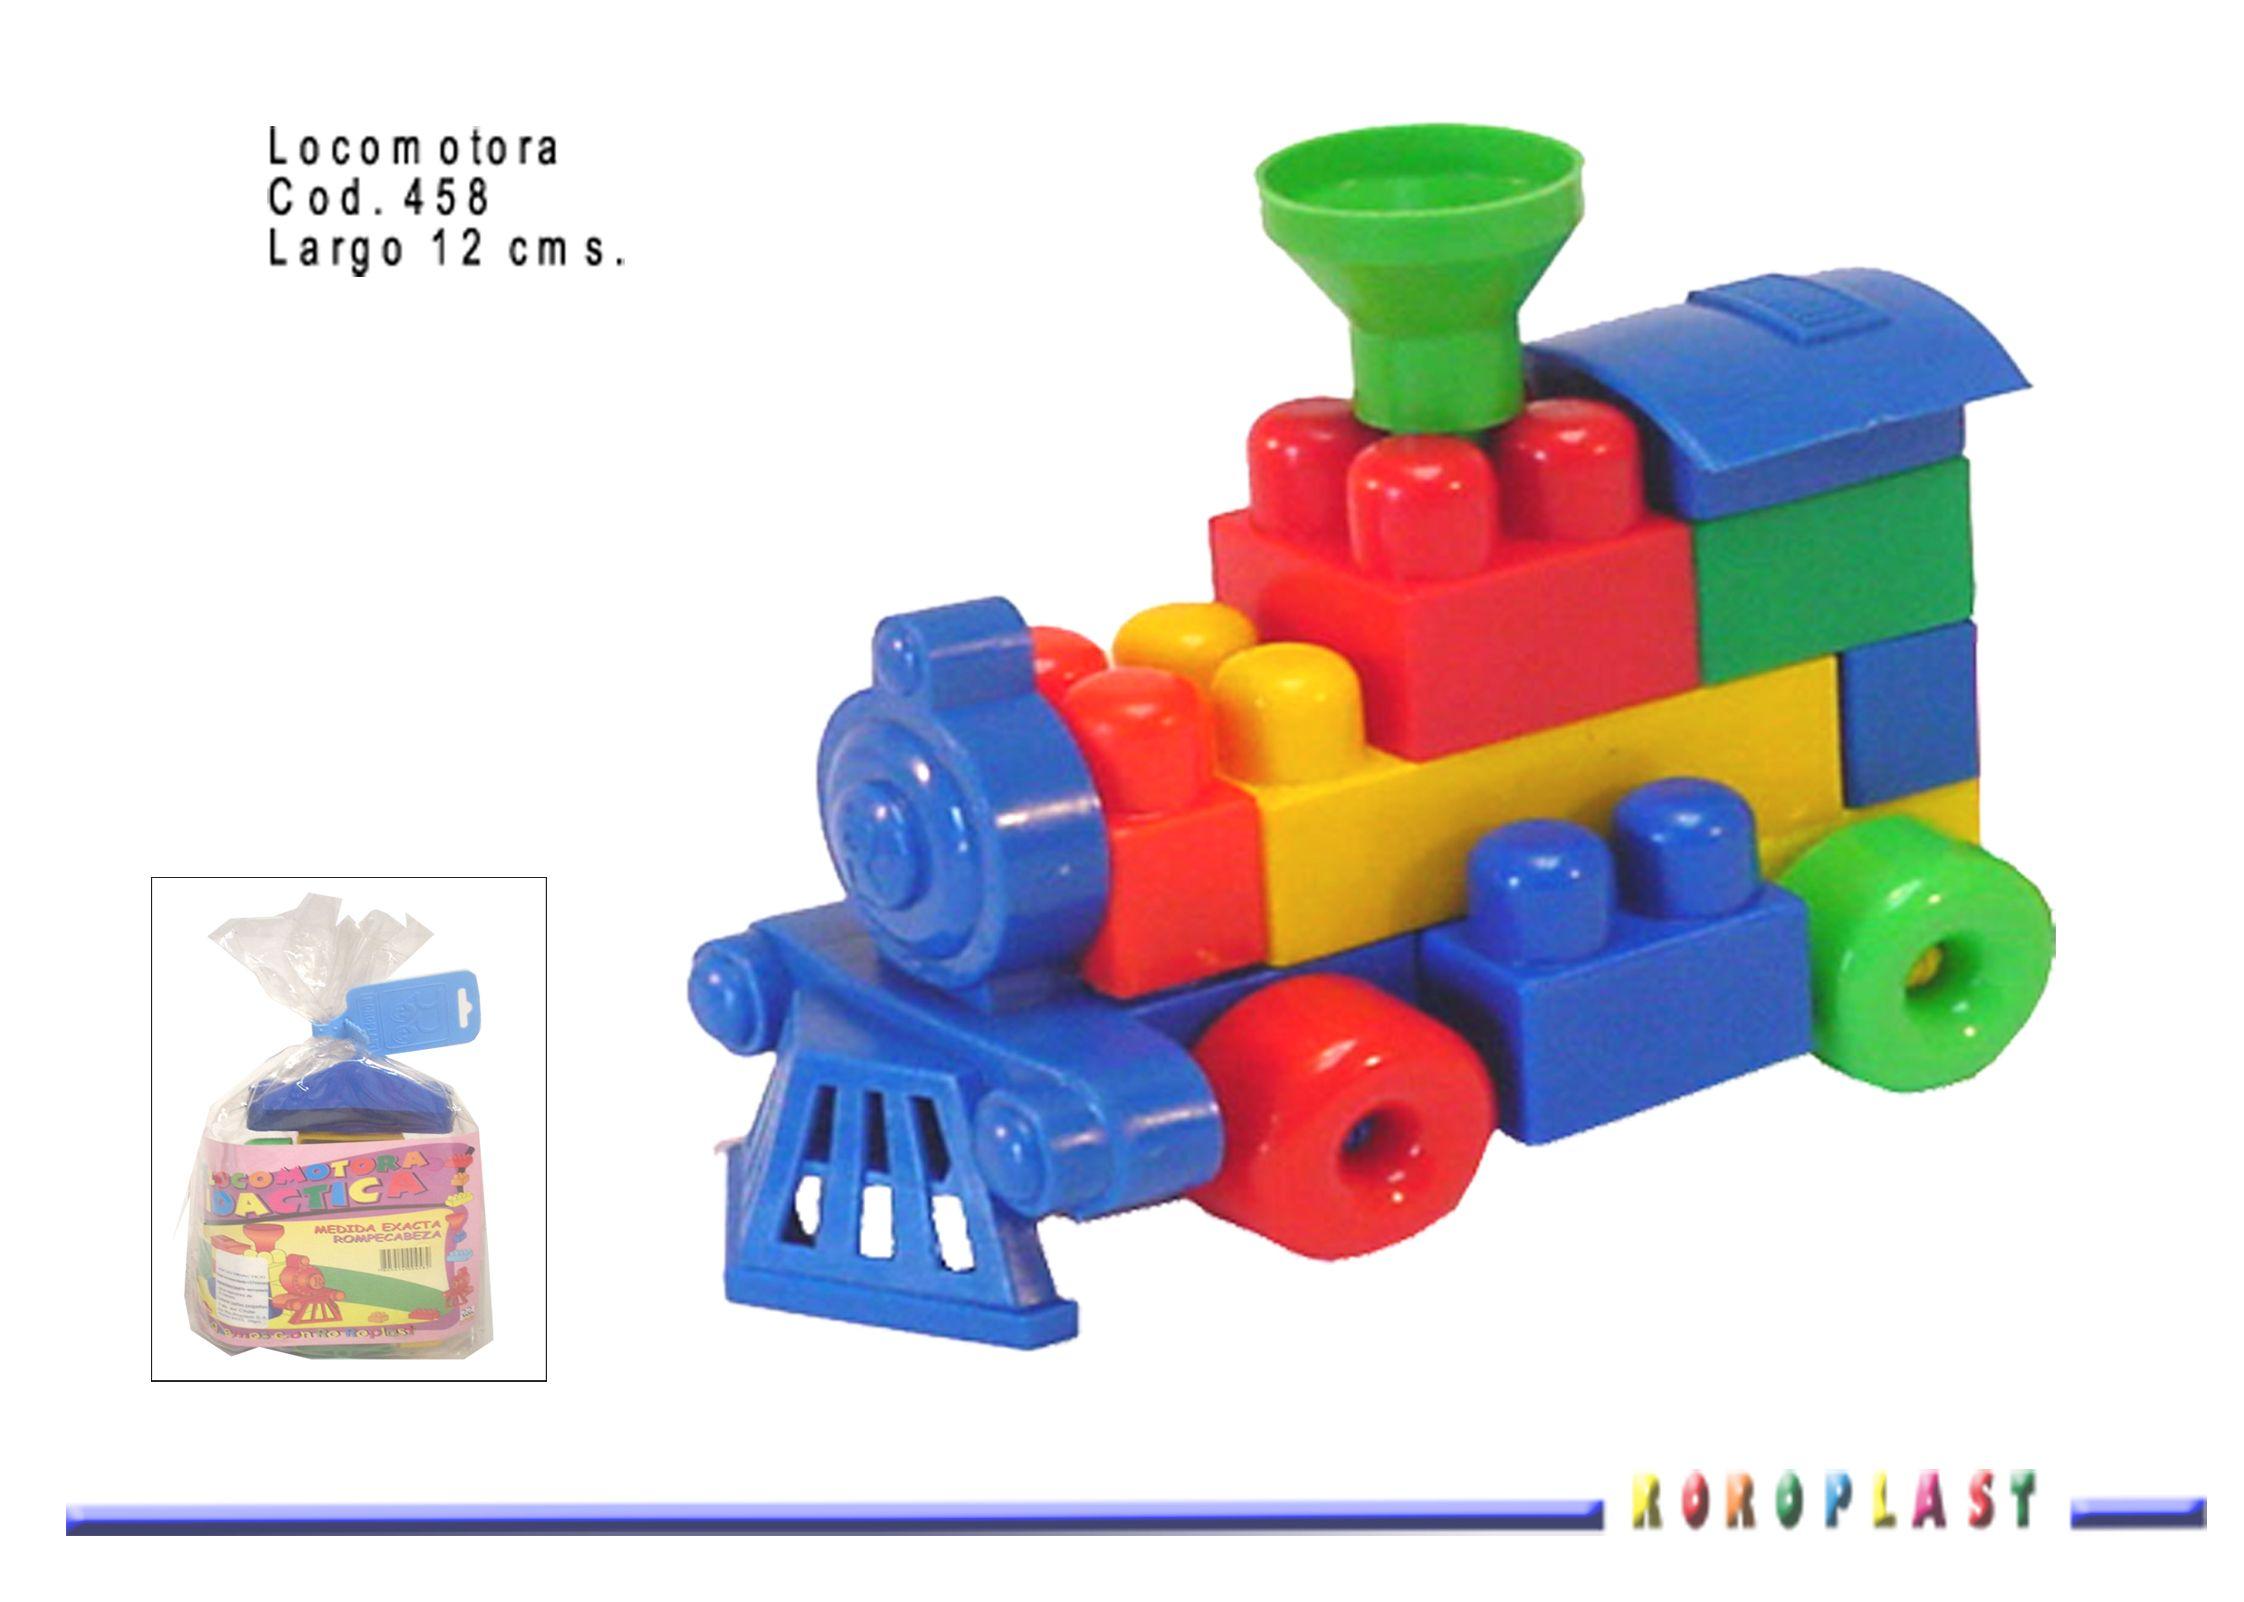 Fabrica de juguetes pl sticos ro roplast for Juguetes de plastico